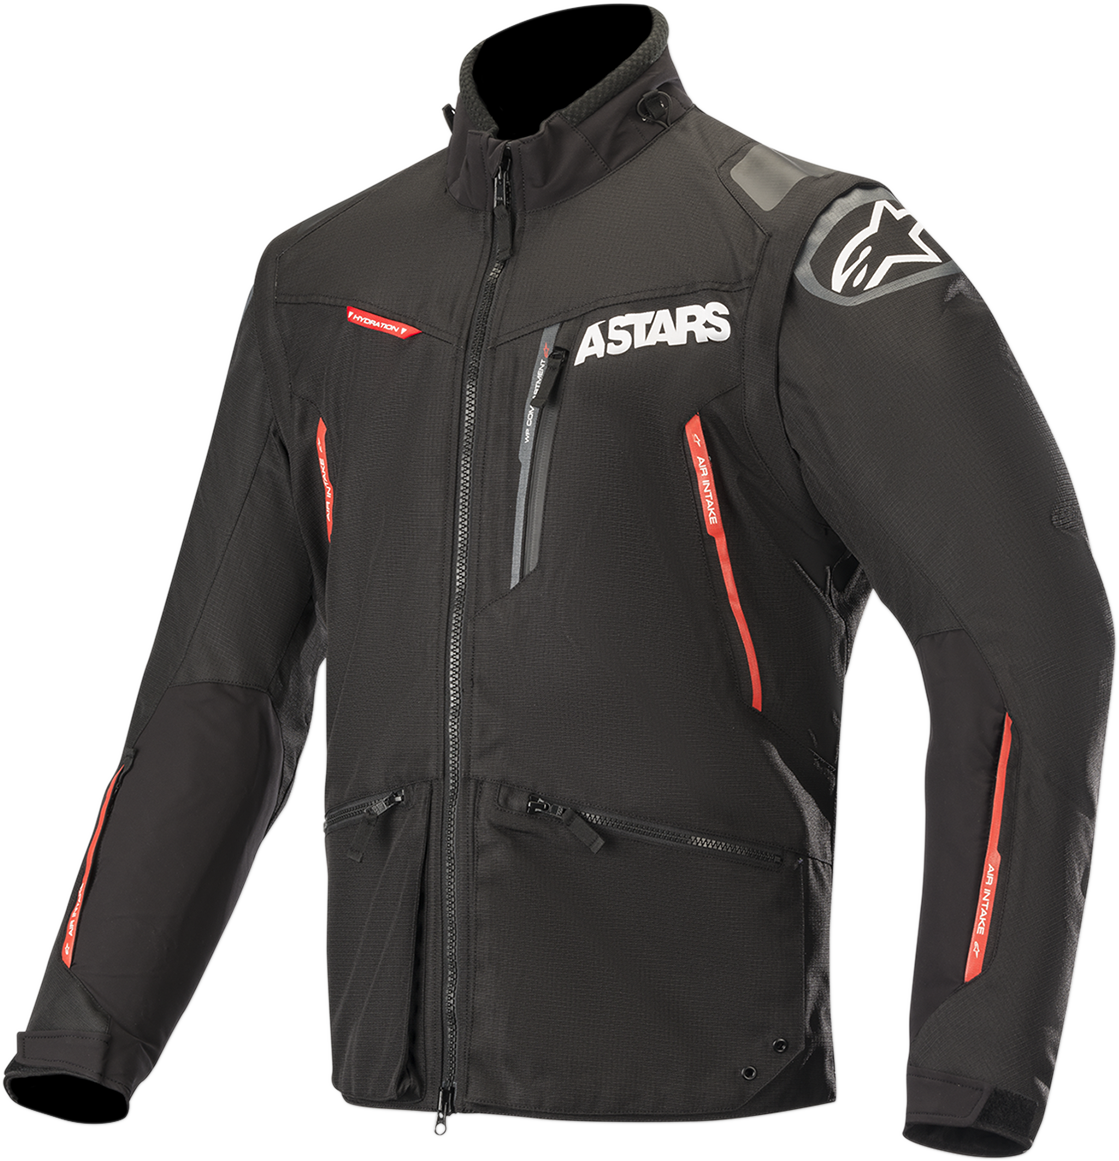 Alpinestars Mens Venture MX Offroad Dual Sport ATV Riding Street Racing Jacket